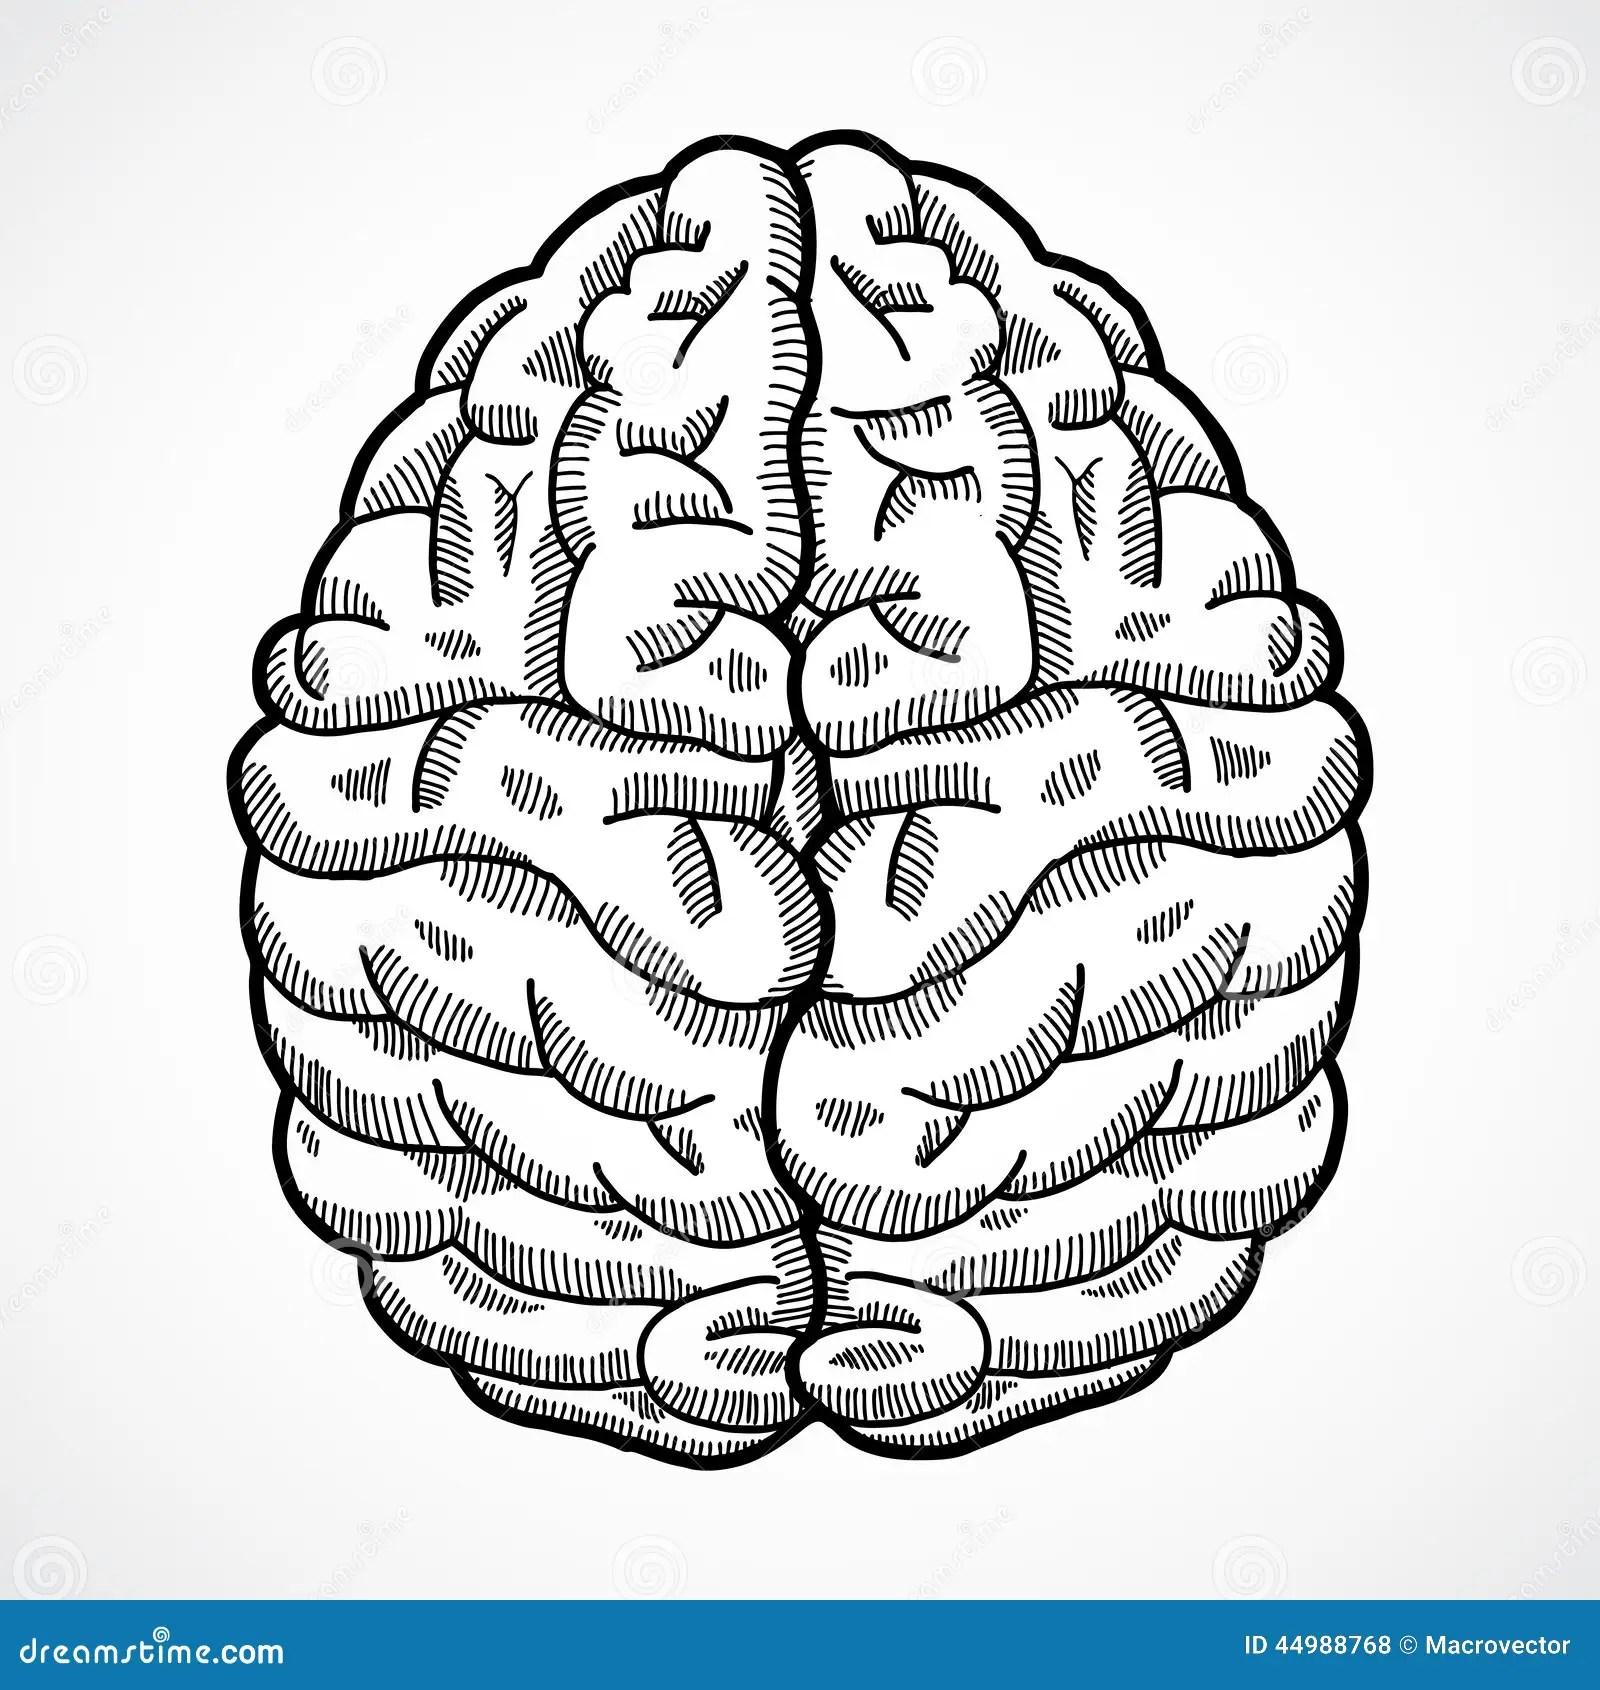 Human Brain Sketch Stock Vector Illustration Of Brainy